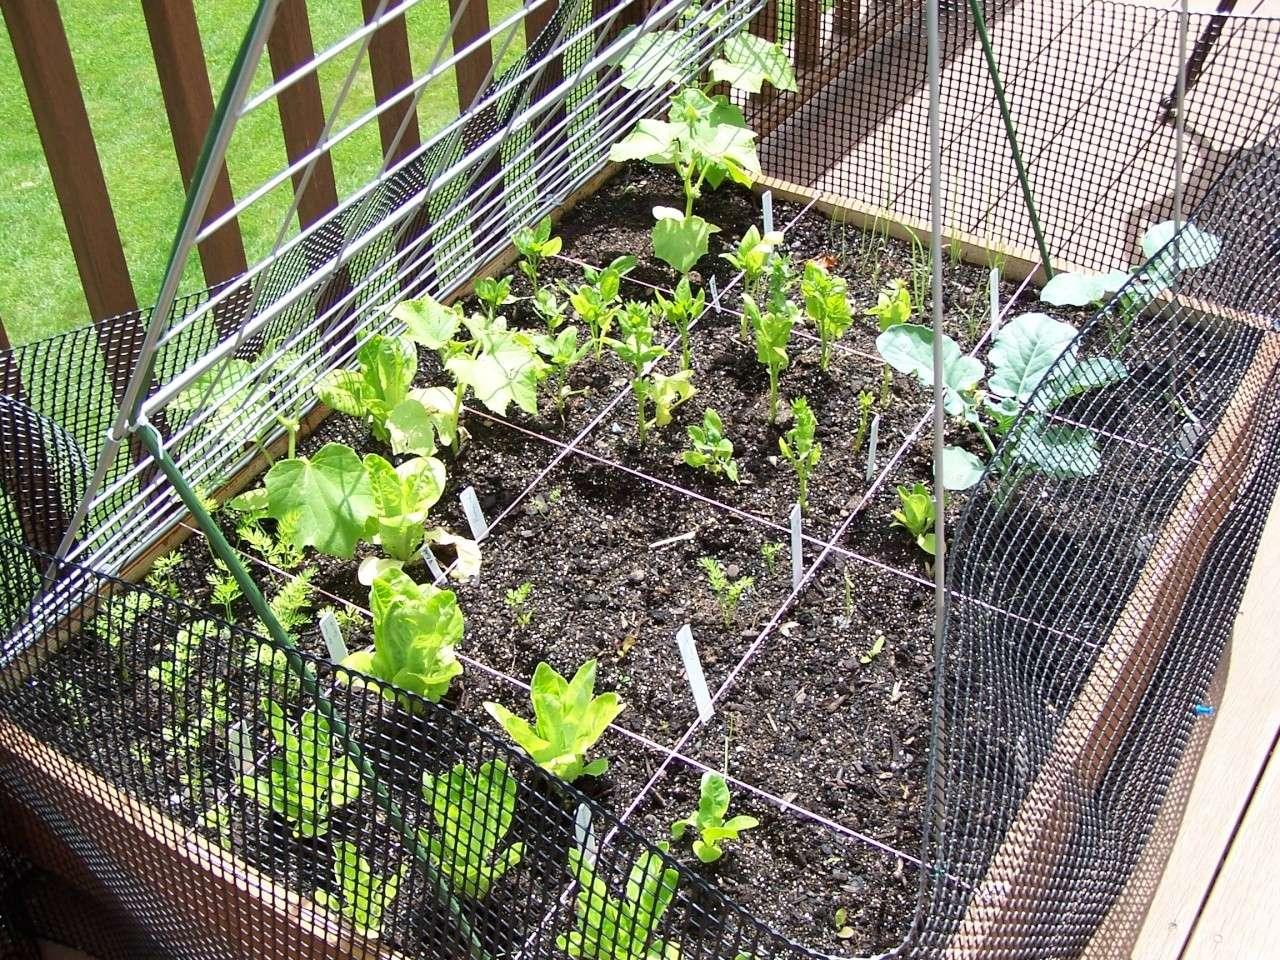 Planting Cantaloupe/Watermelon/Pumpkin Vertically? 100_0311